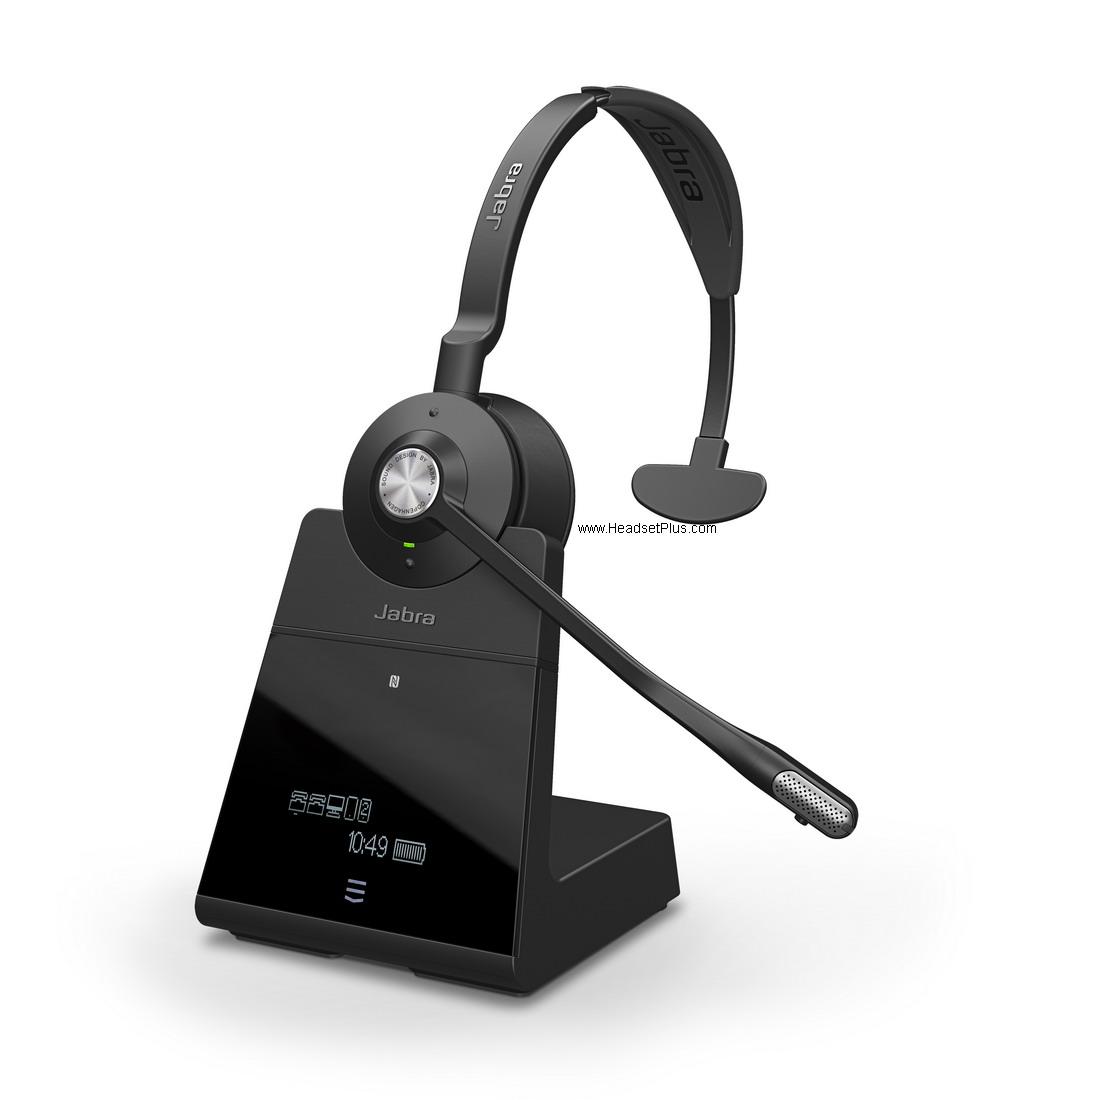 83b9ec7ab78 Plantronics Savi 8220 Binaural Stereo Wireless Headset 207325-01 ...